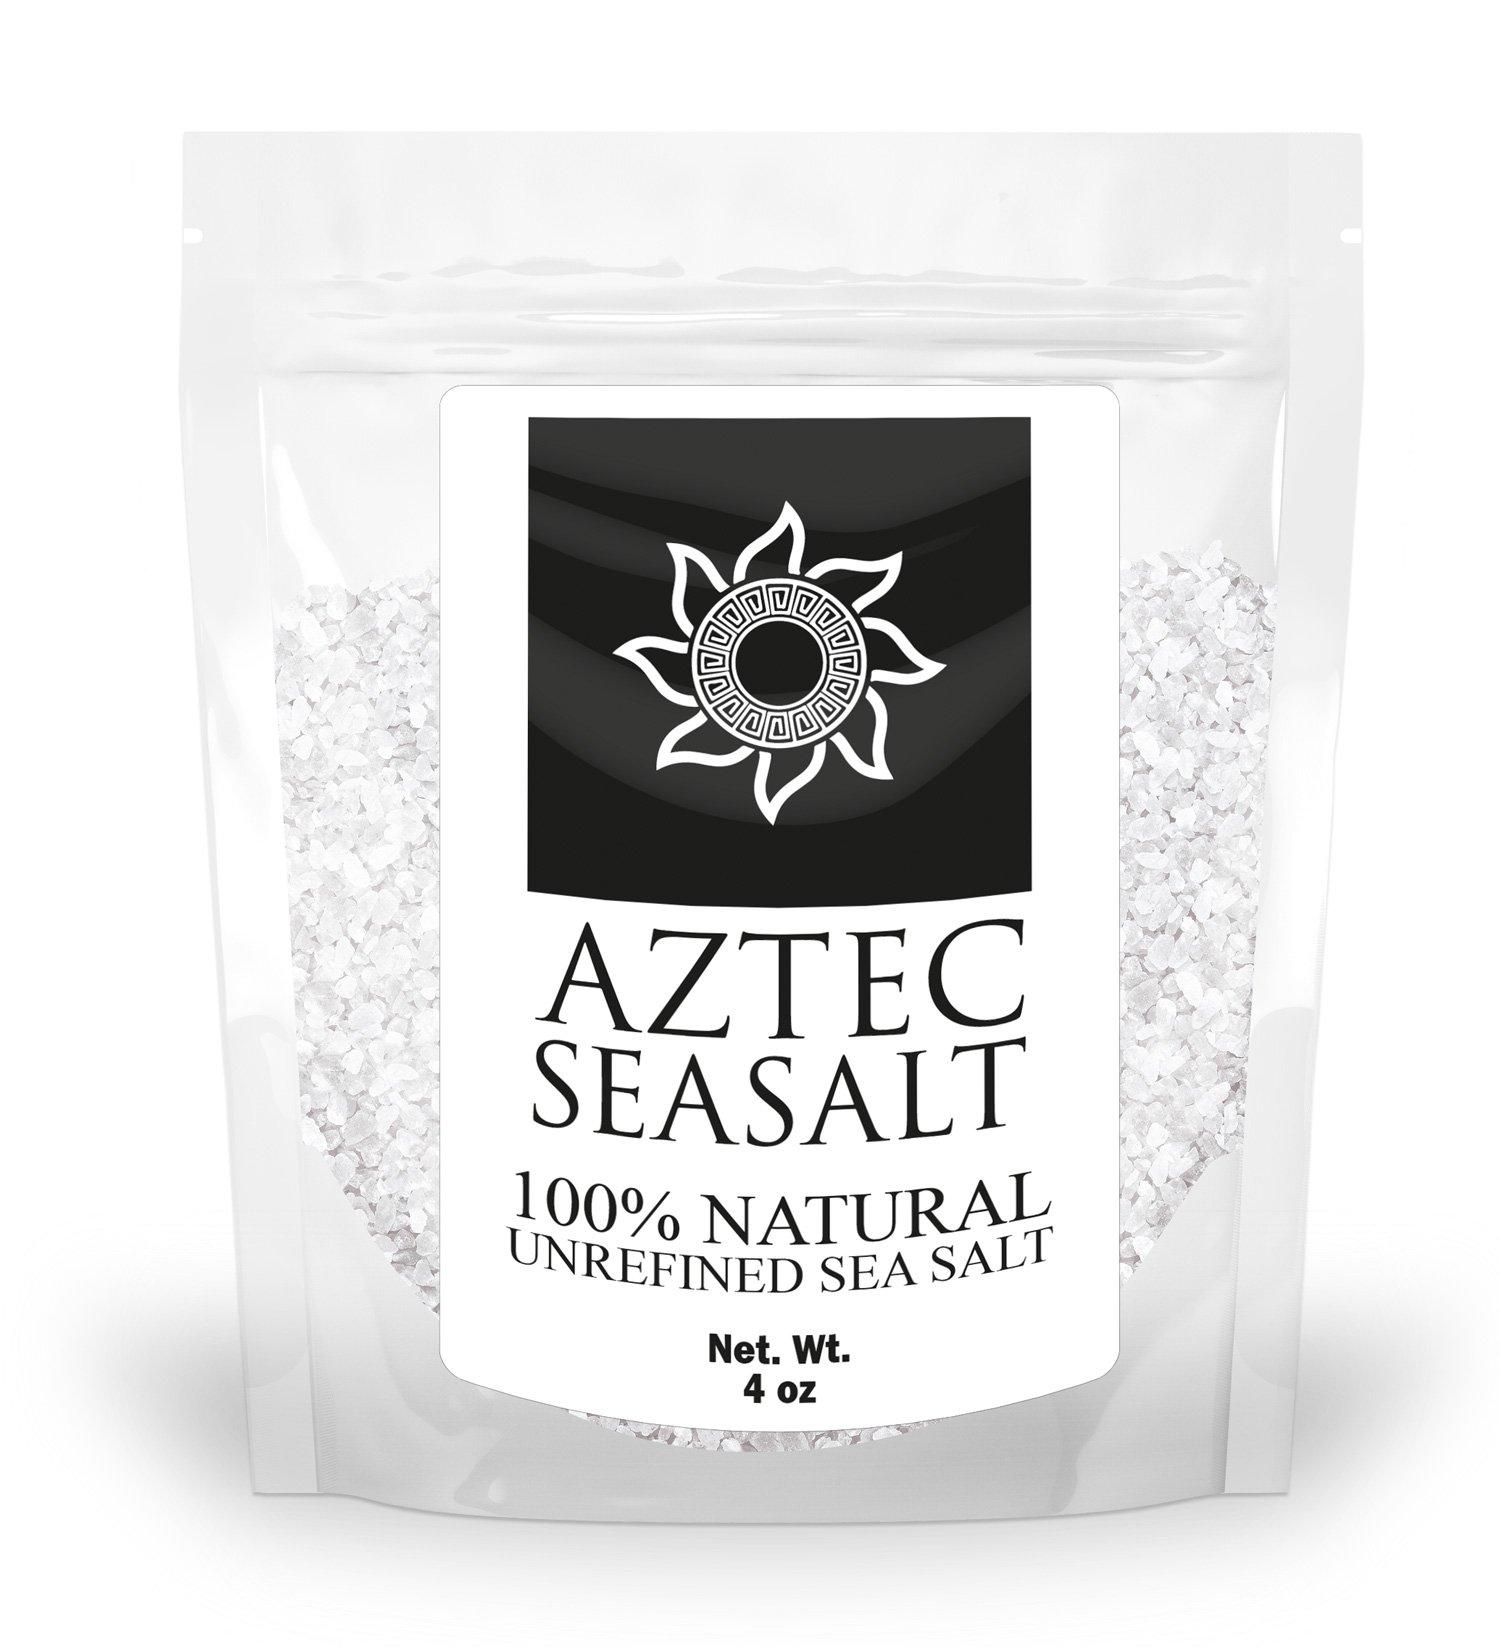 Coarse Salt - Sea Salt - Natural, Unrefined Sea Salt - More Minerals Than Himalayan Pink or Rock Salt - Substitute for Iodized Sea Salt - Unprocessed & Hand Harvested By Artisans - 100% Satisfaction Lifetime Guarantee